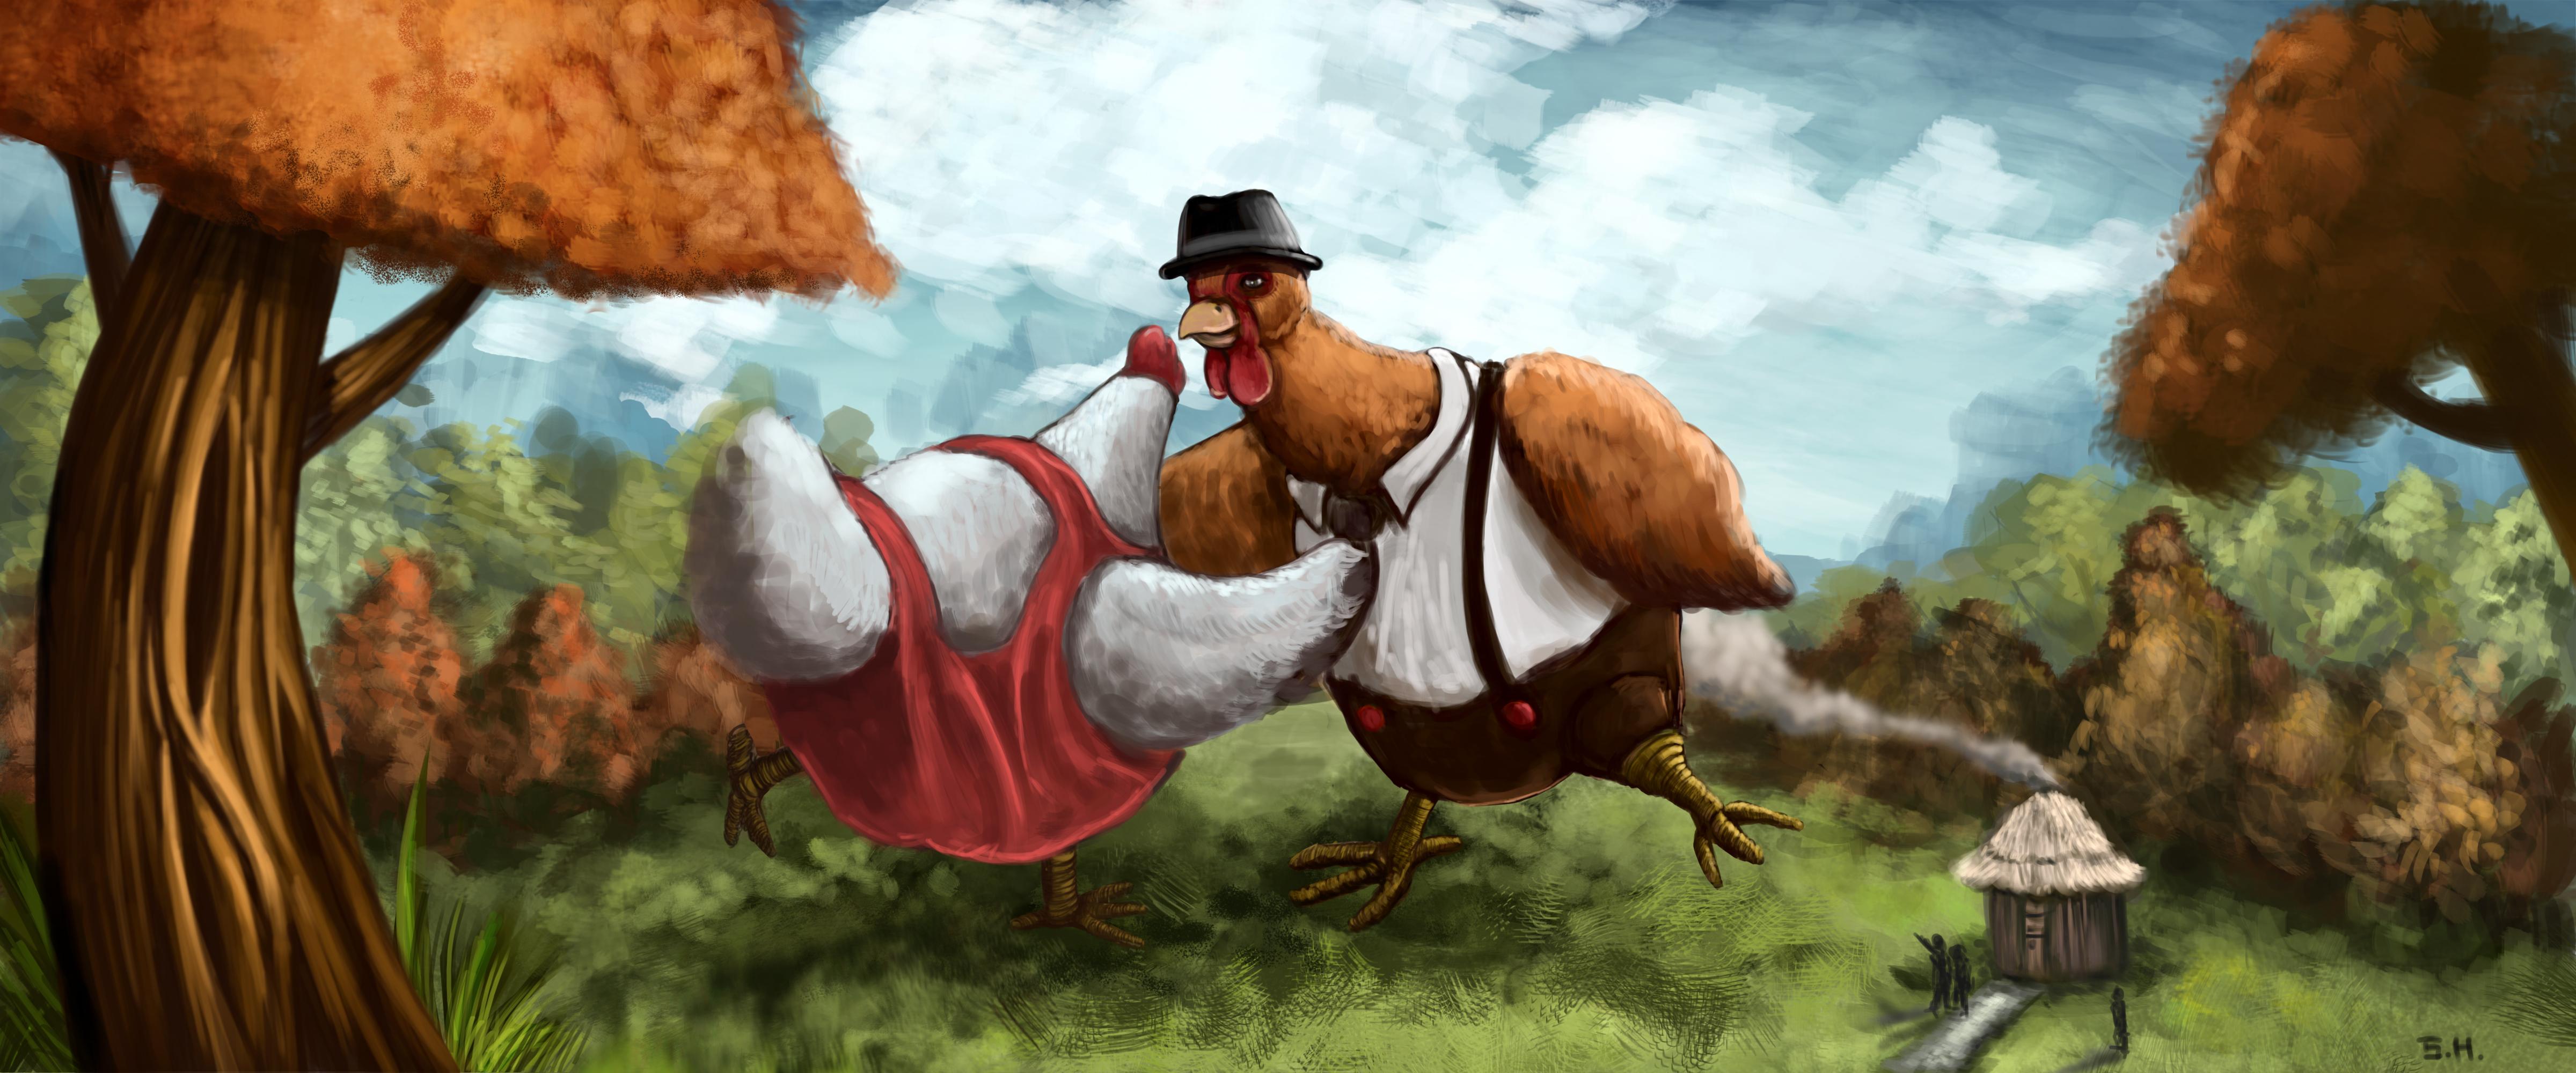 dancing chicken the art of chi kei sam ho